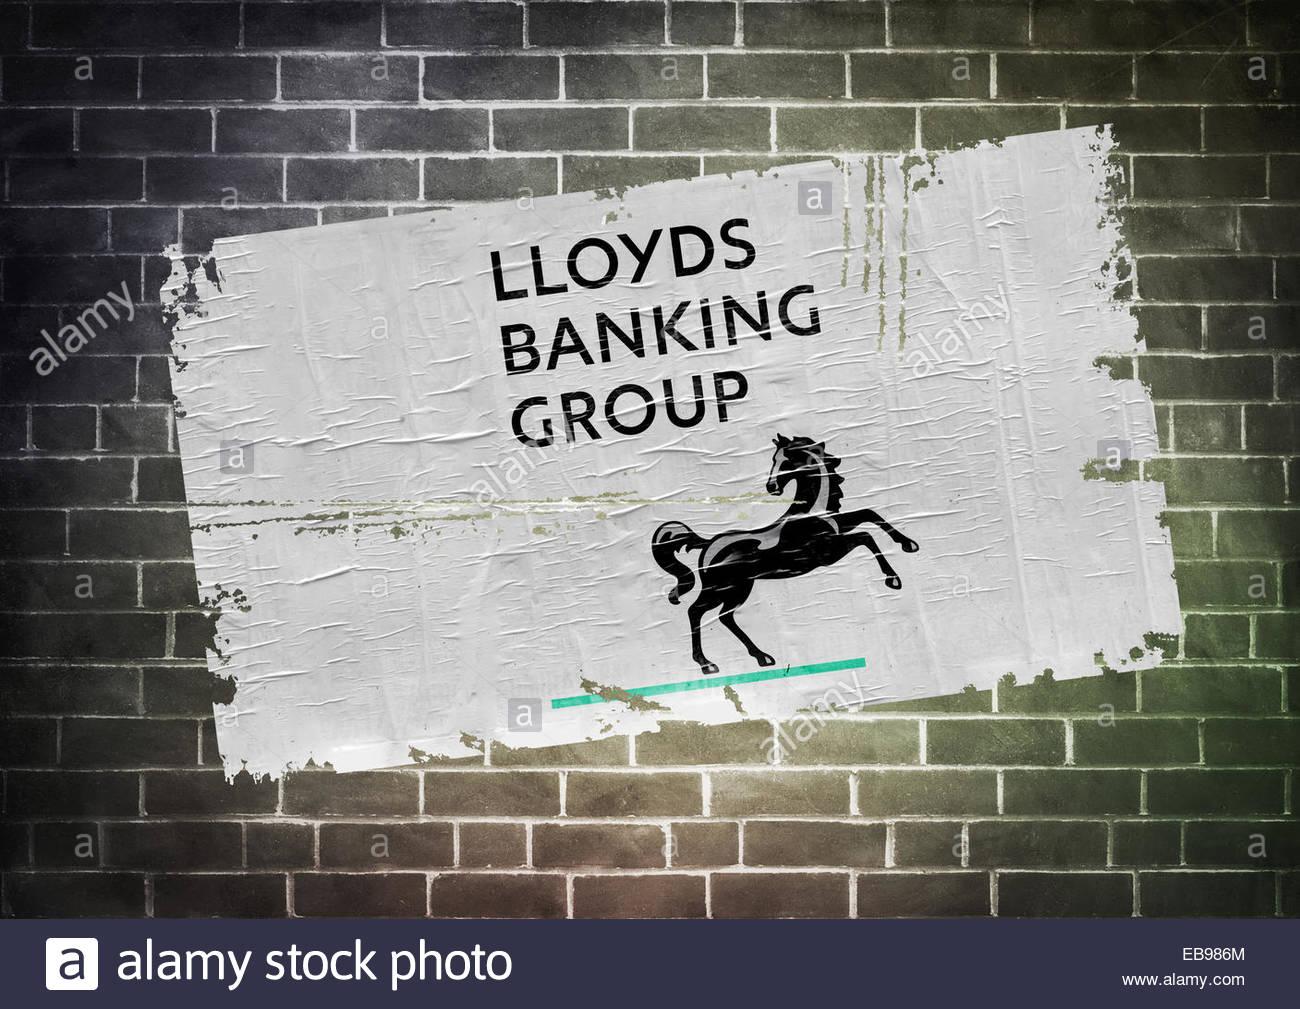 Lloyds Bank logo icon poster - Stock Image